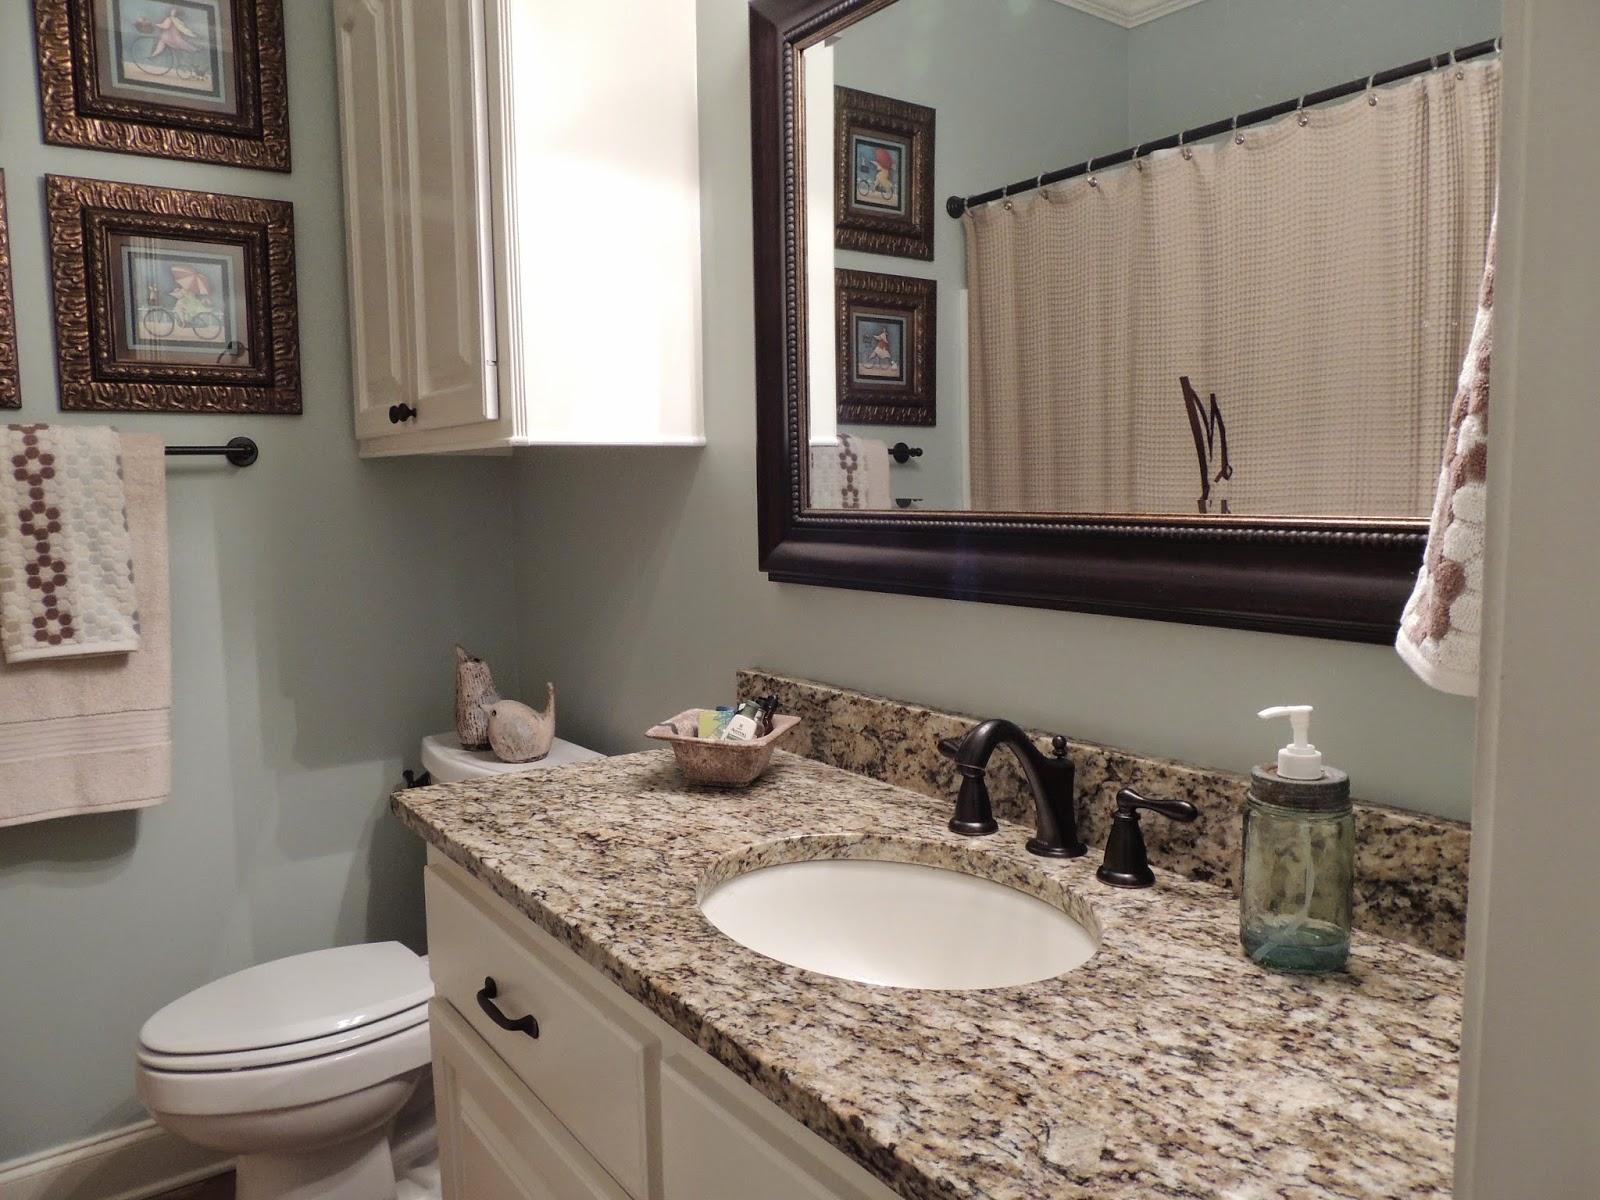 Buttercup Bliss Guest Bathroom Renovation - Guest bathroom renovation